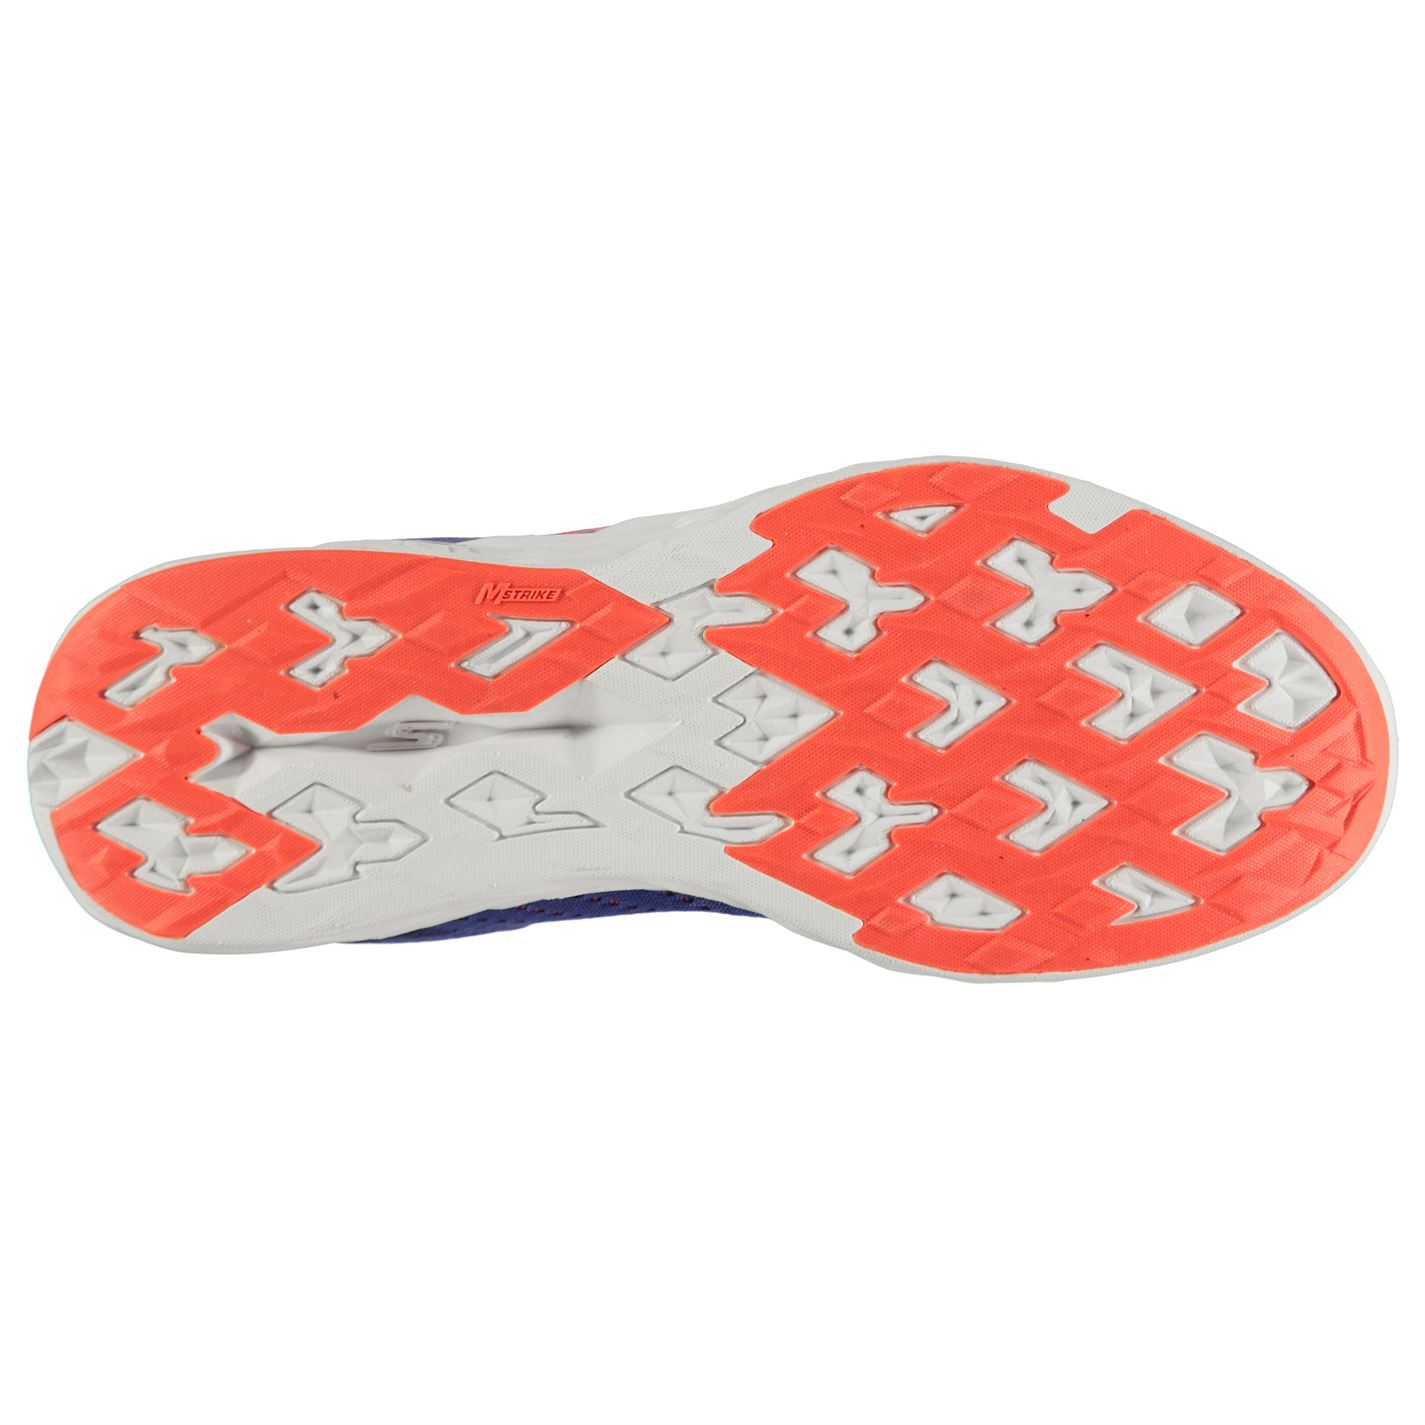 Skechers GOrun 5 5 5 Running schuhe Road Mens 45b3f4